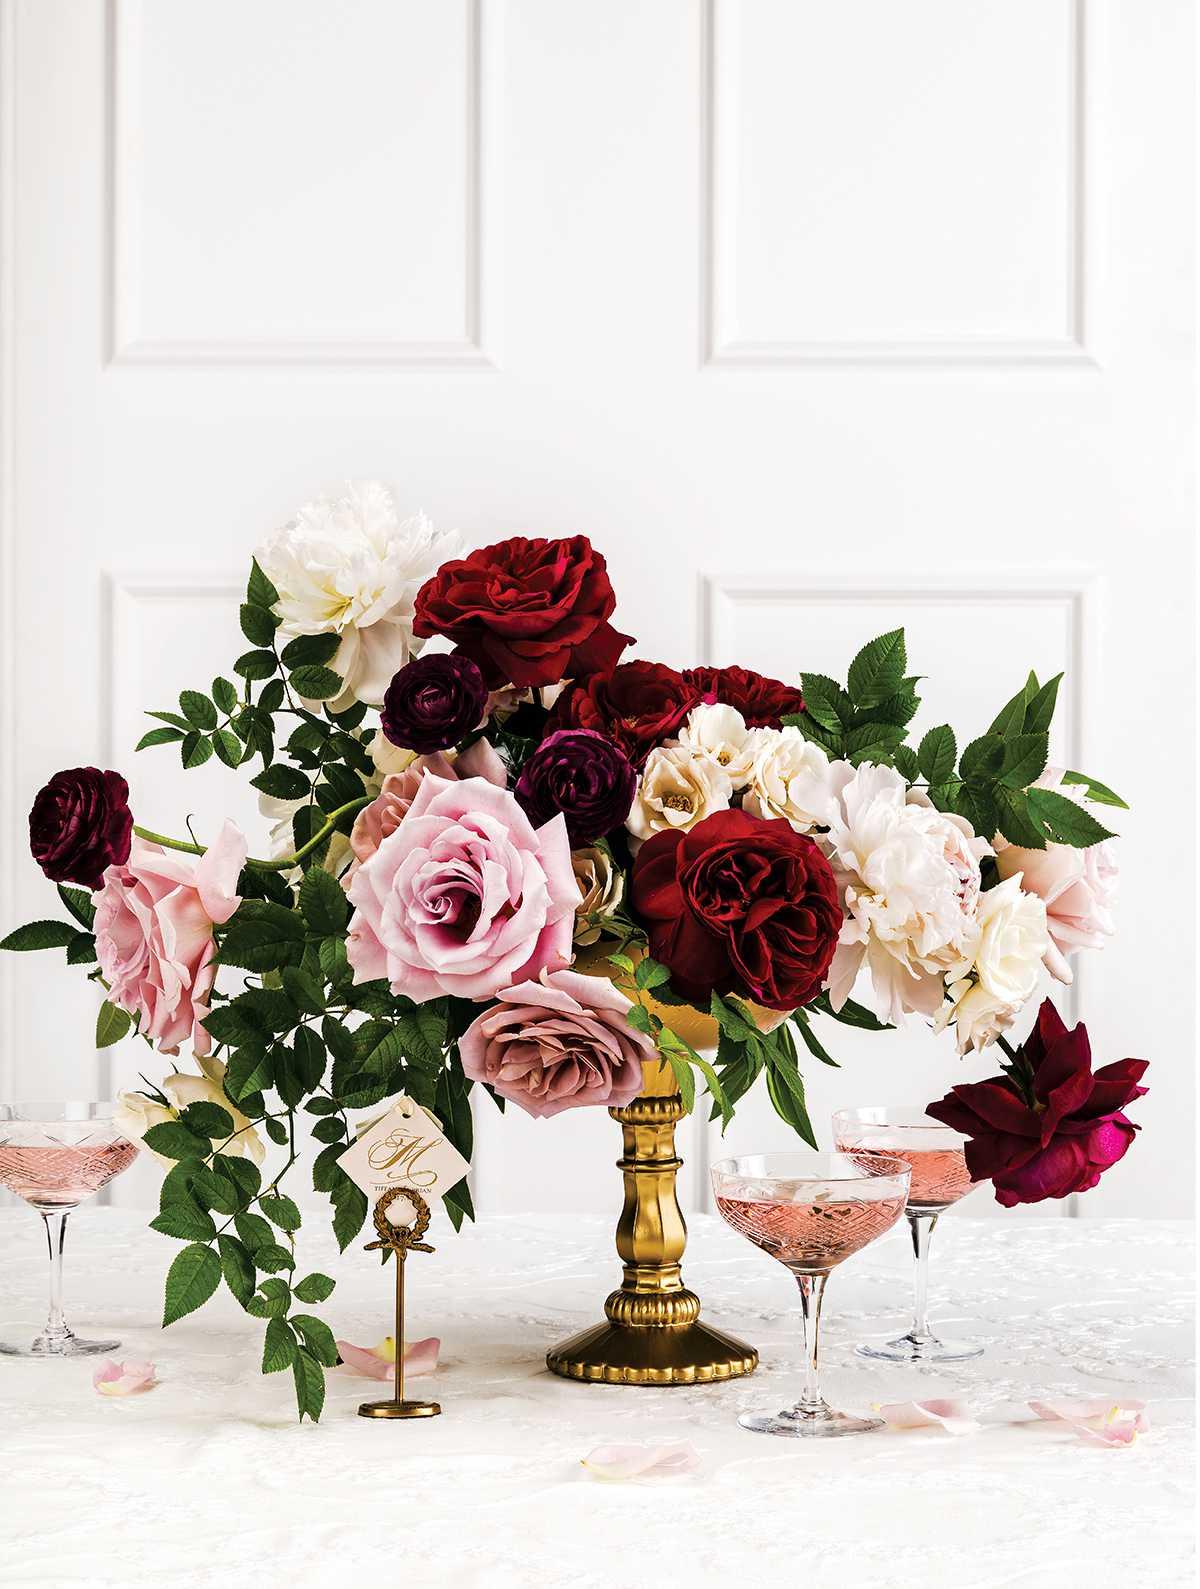 Rose Winter Wedding Flower